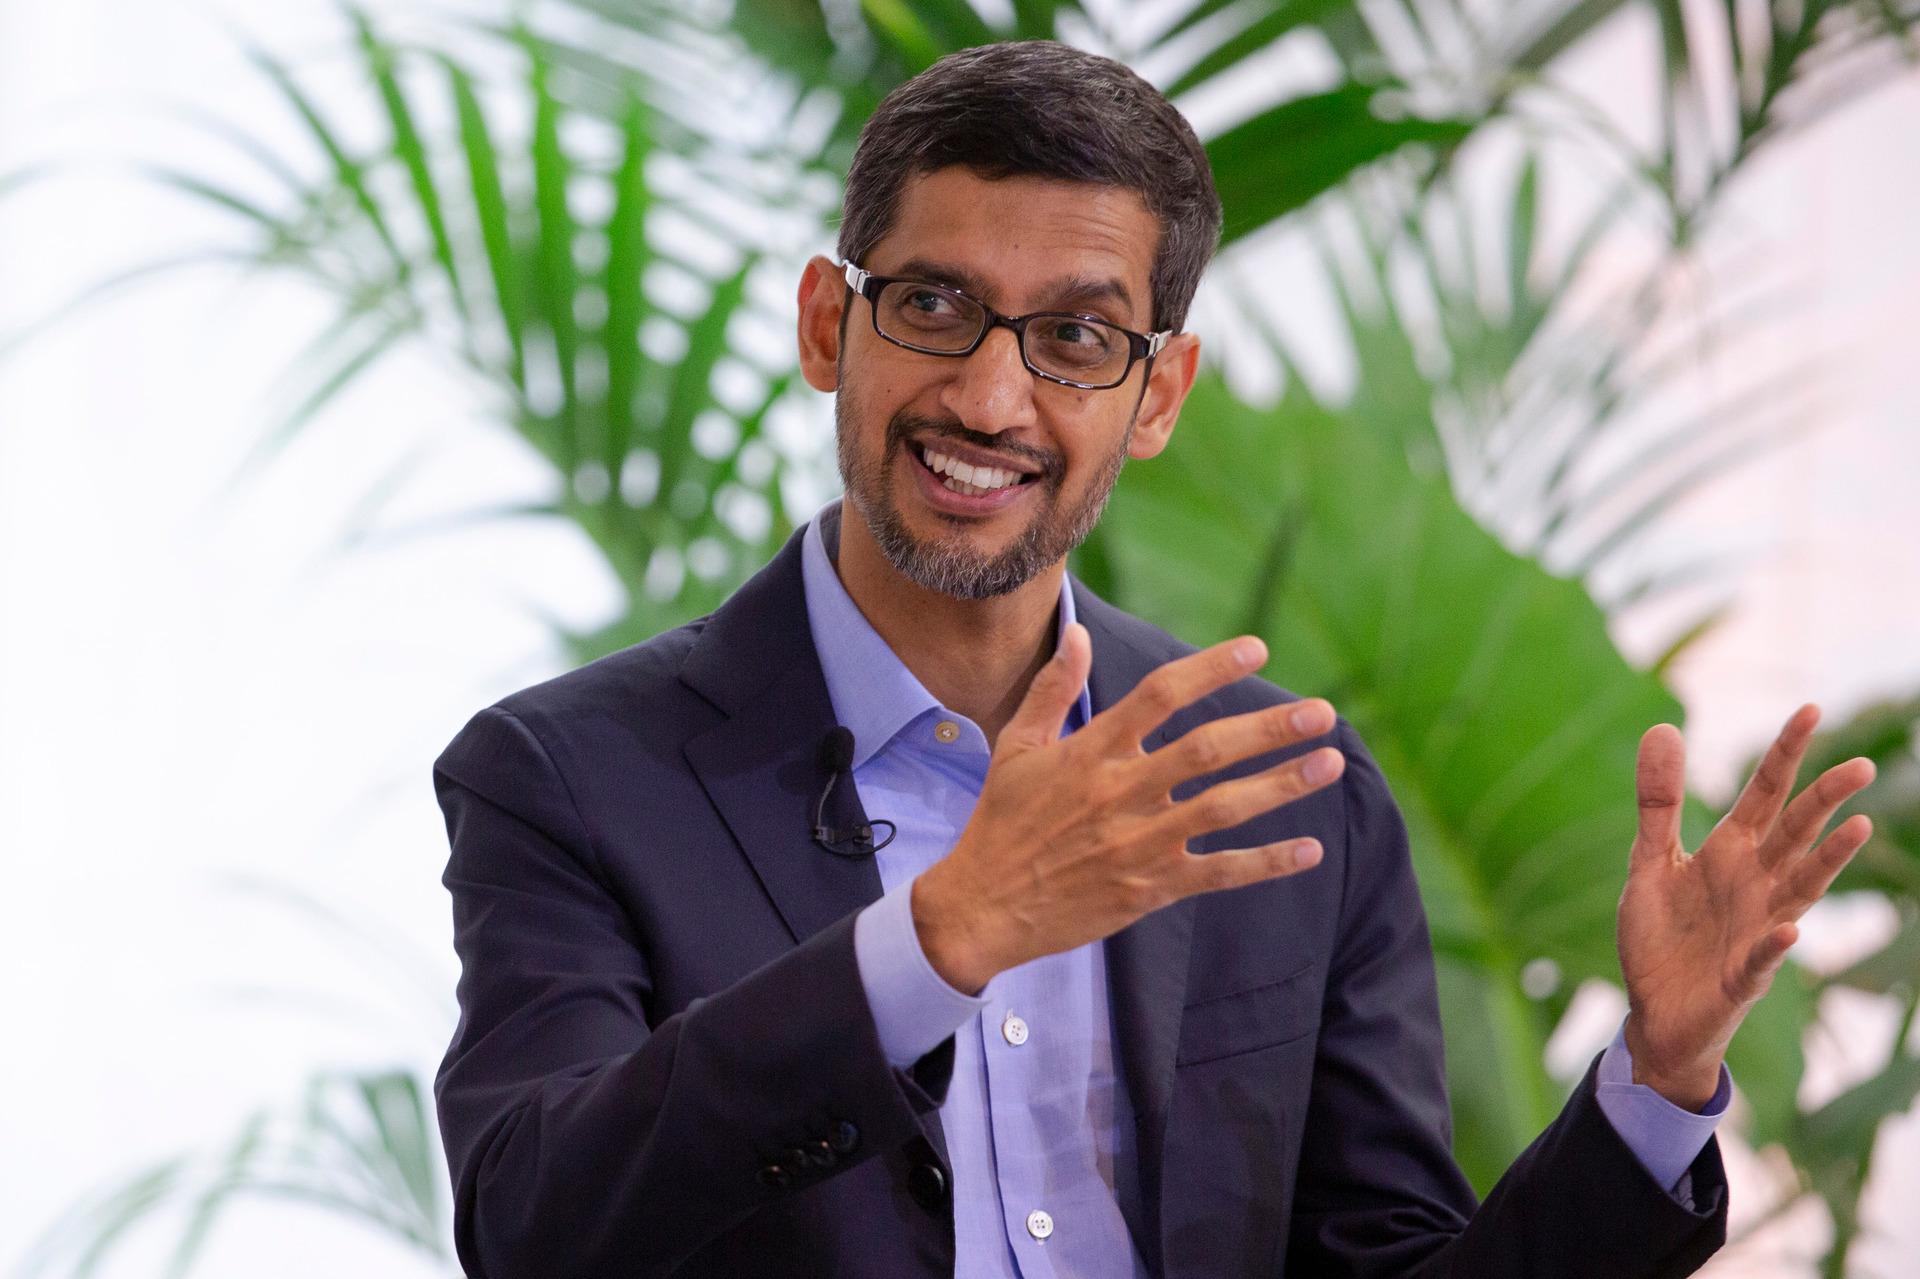 Google CEO: AI more profound change than electricity